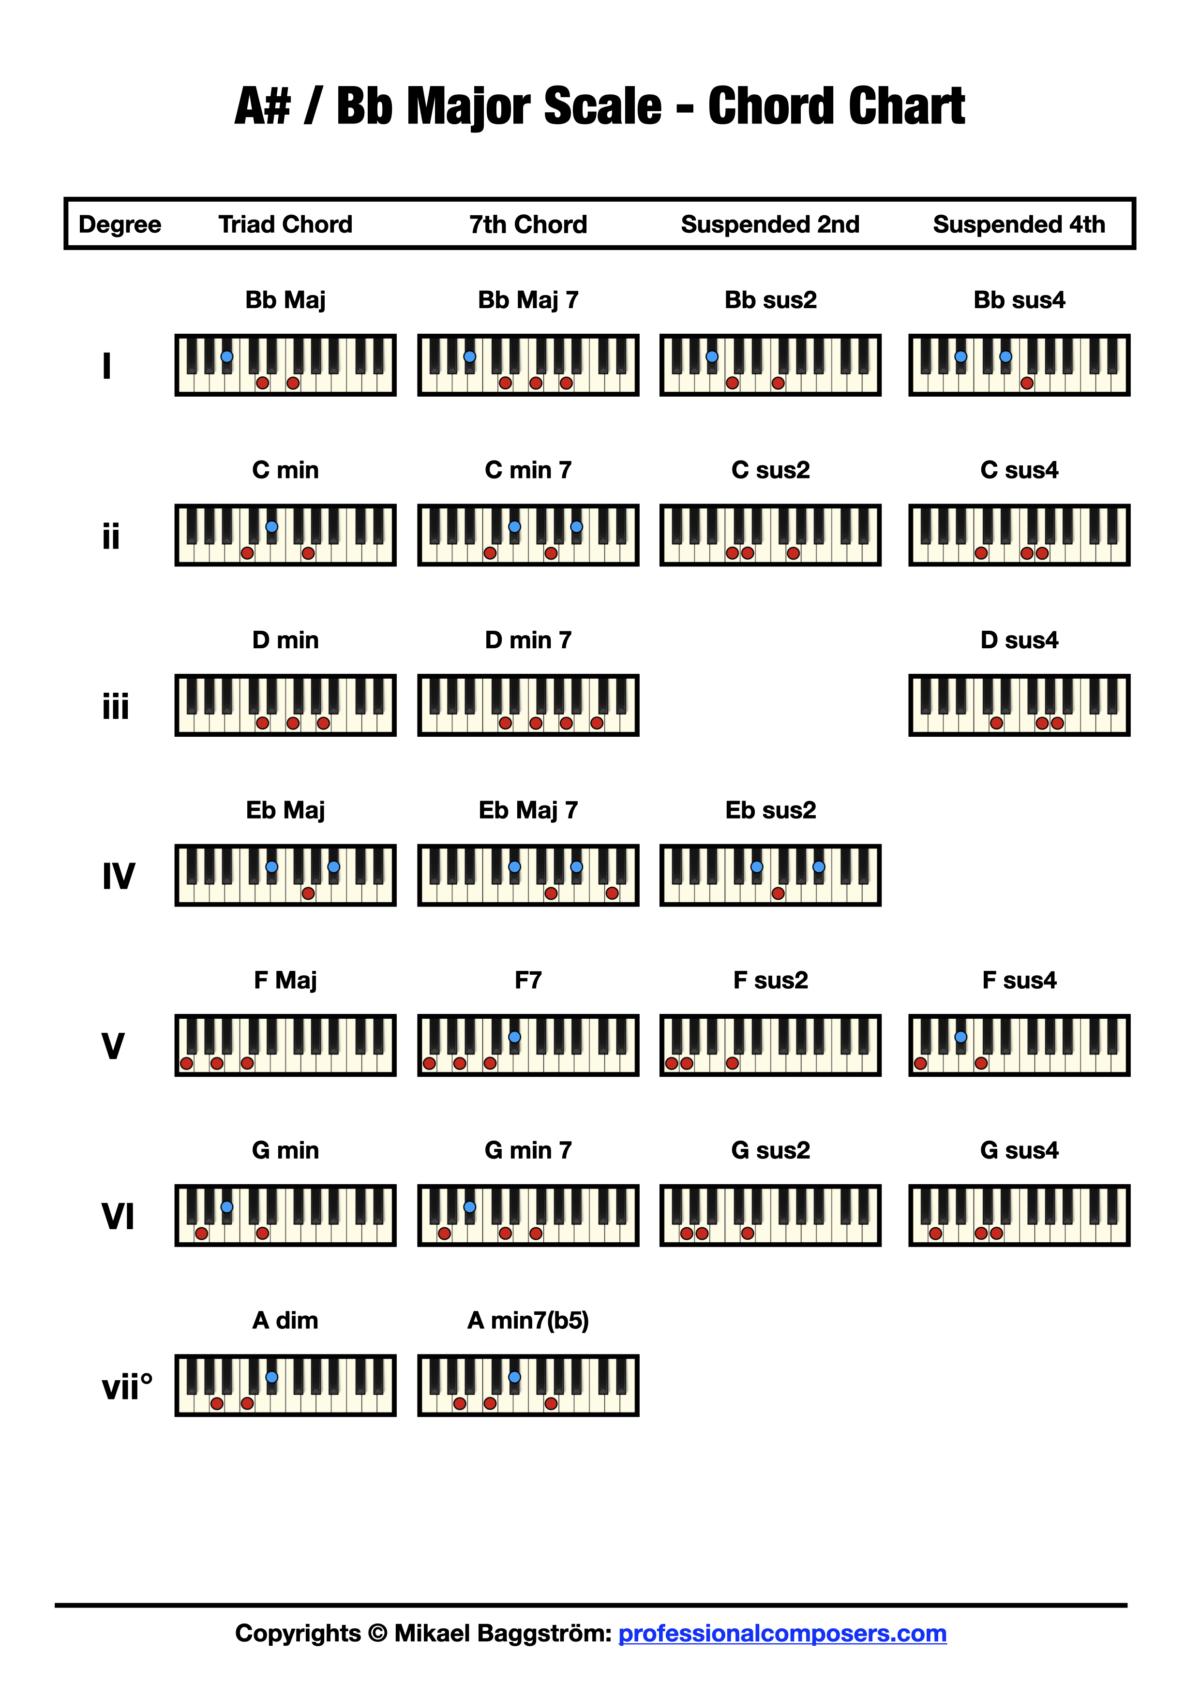 Chord Chart - Bb Major Scale